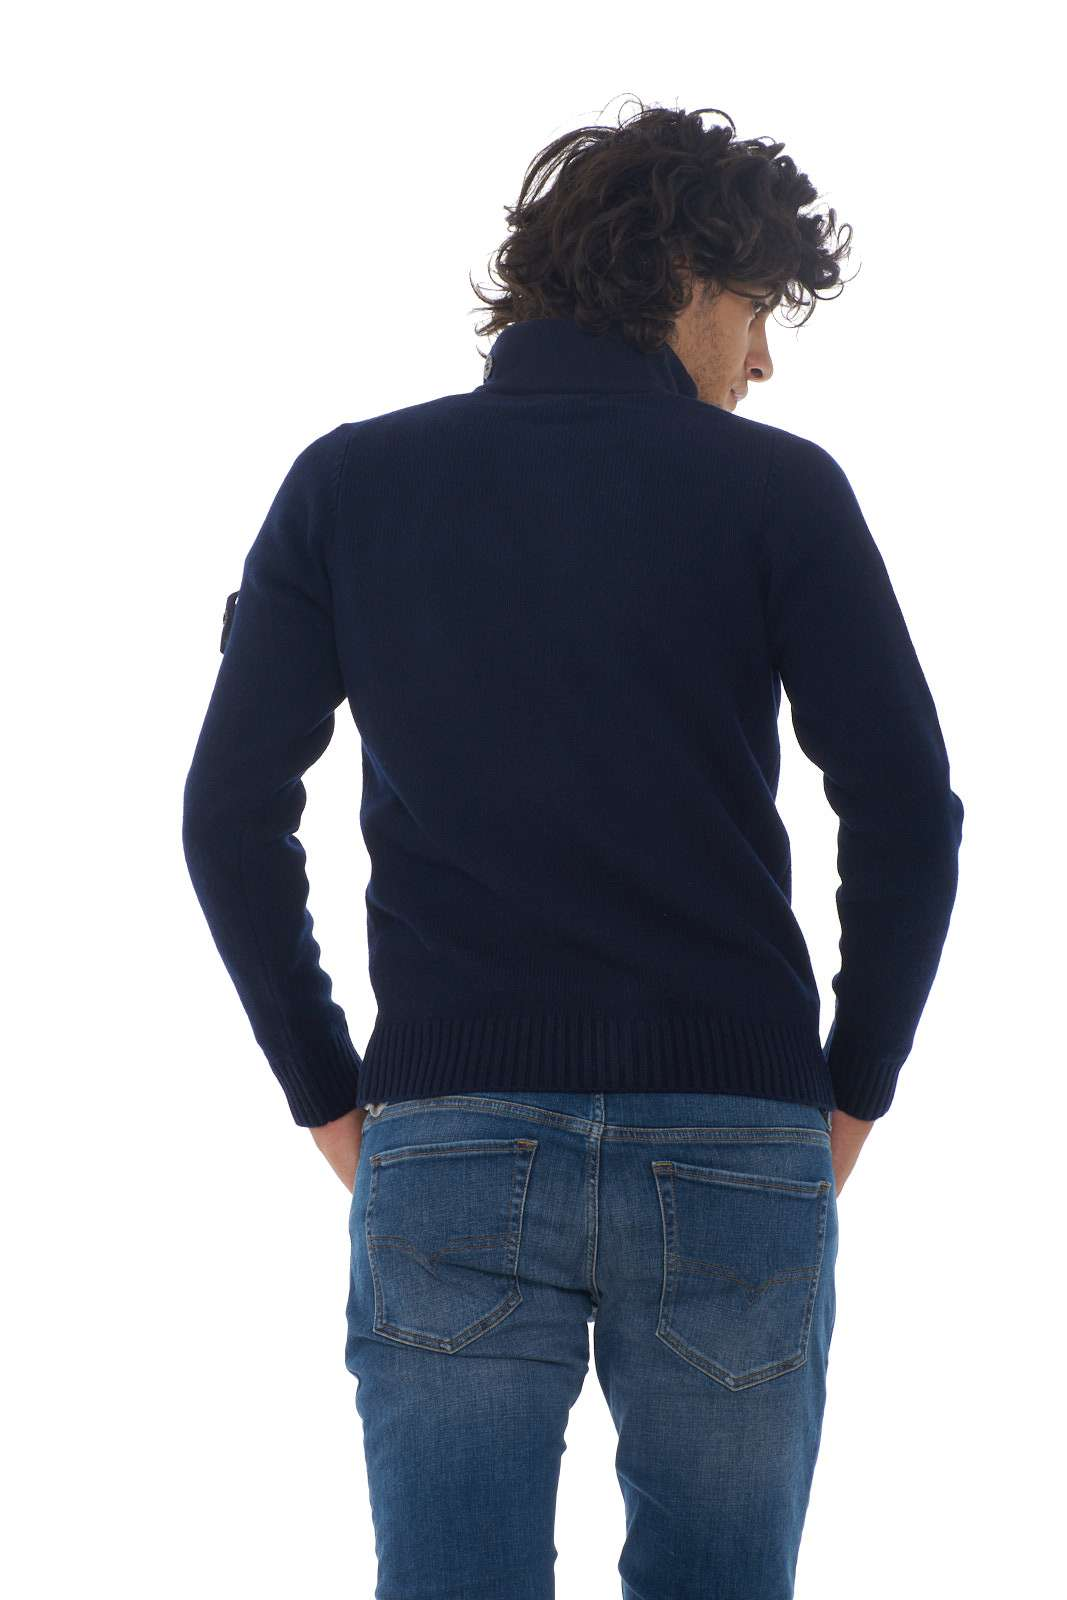 https://www.parmax.com/media/catalog/product/a/i/AI-outlet_parmax-cardigan-uomo-Stone-Island-7115564A3-C.jpg